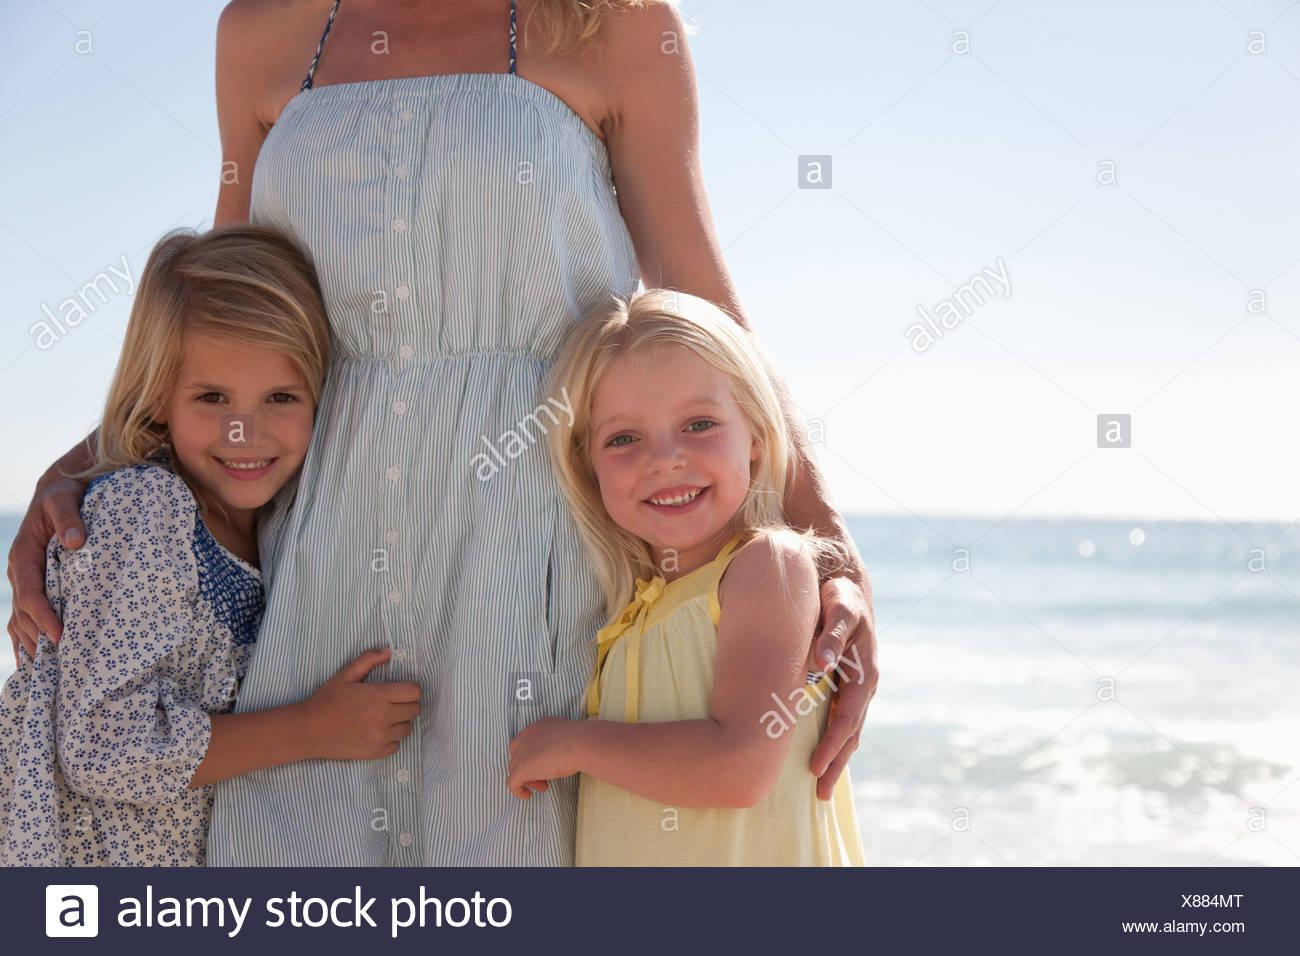 Girls hugging mother on beach - Stock Image